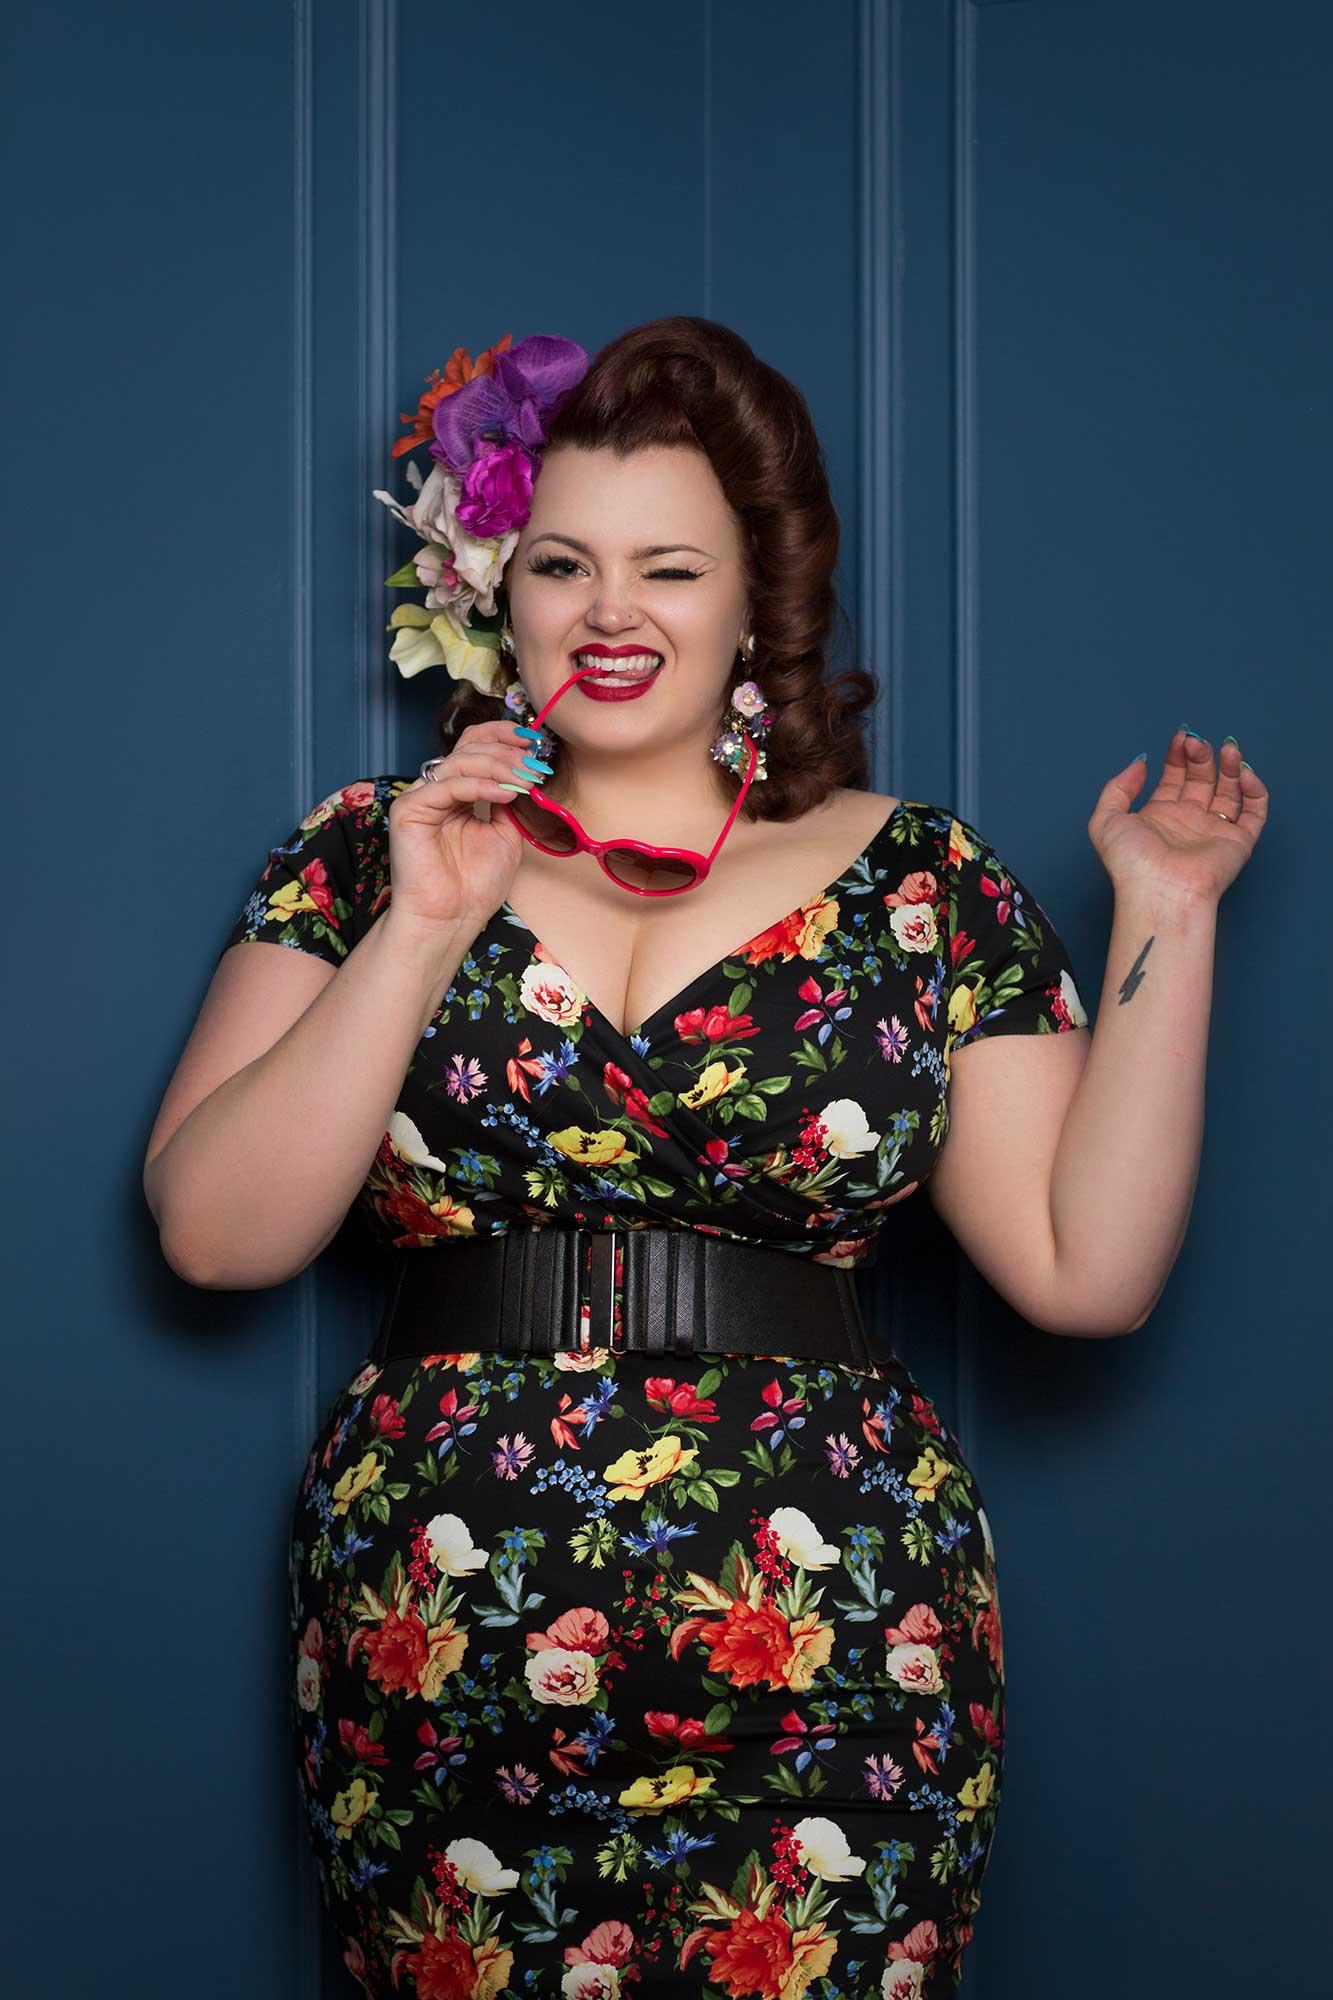 House Of Burlesque Branding Photoshoot by Hertfordshire Brand Photographer Tigz Rice Ltd 2021.